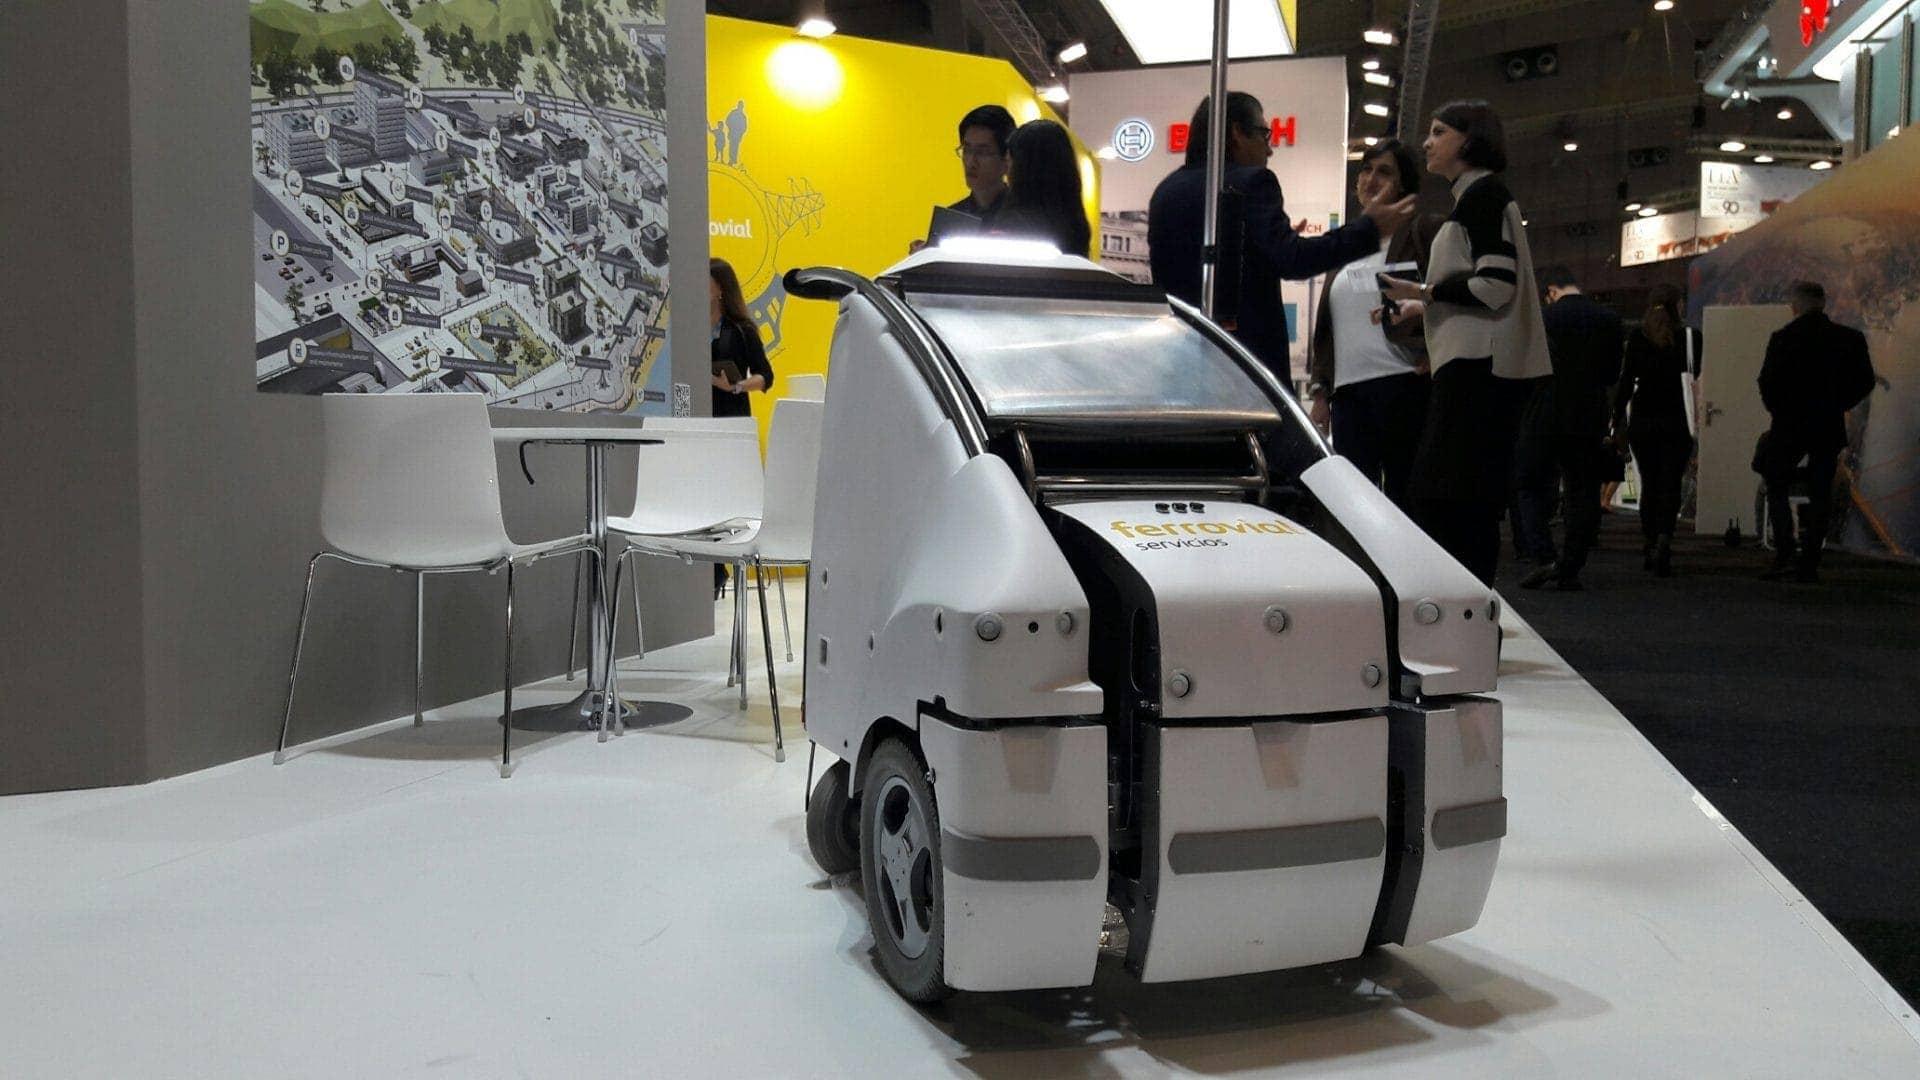 Global Robot Expo 2017 Ferrovial reto Madrid